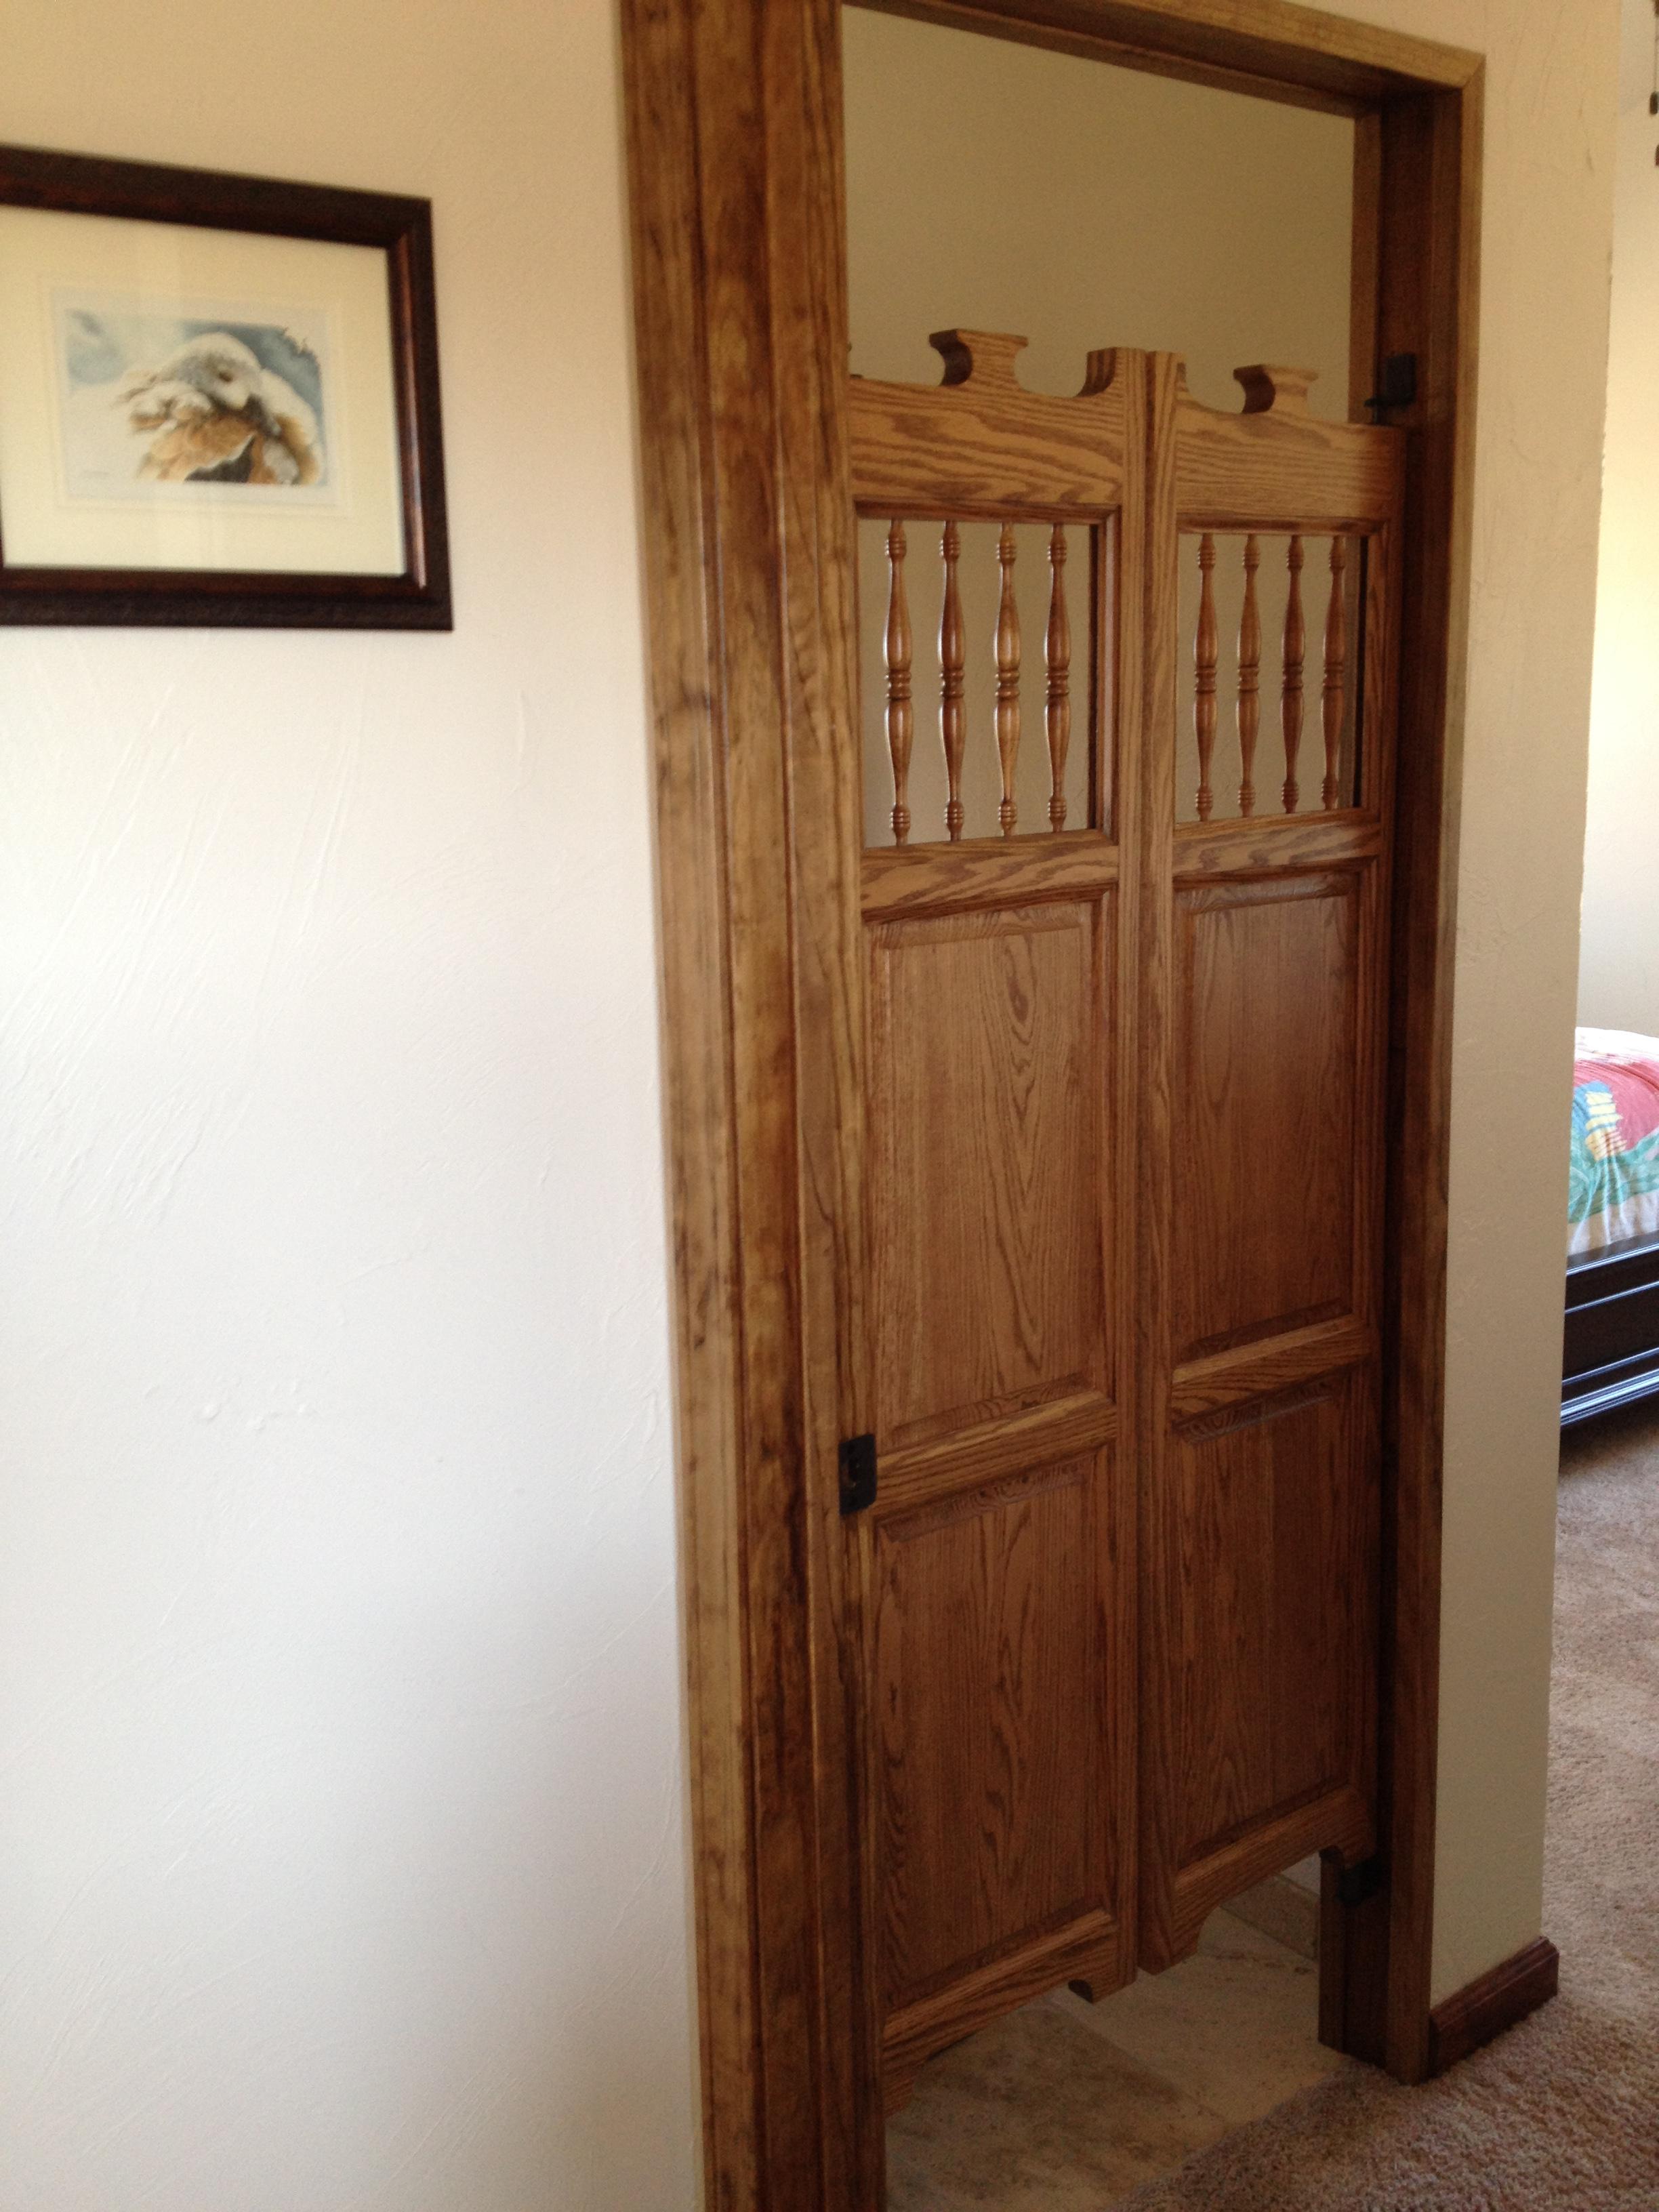 old-western-saloon-doors-finished.jpg & Old Western Oak Cafe Saloon Doors (2 ft - 3 ft Door Openings) Pezcame.Com